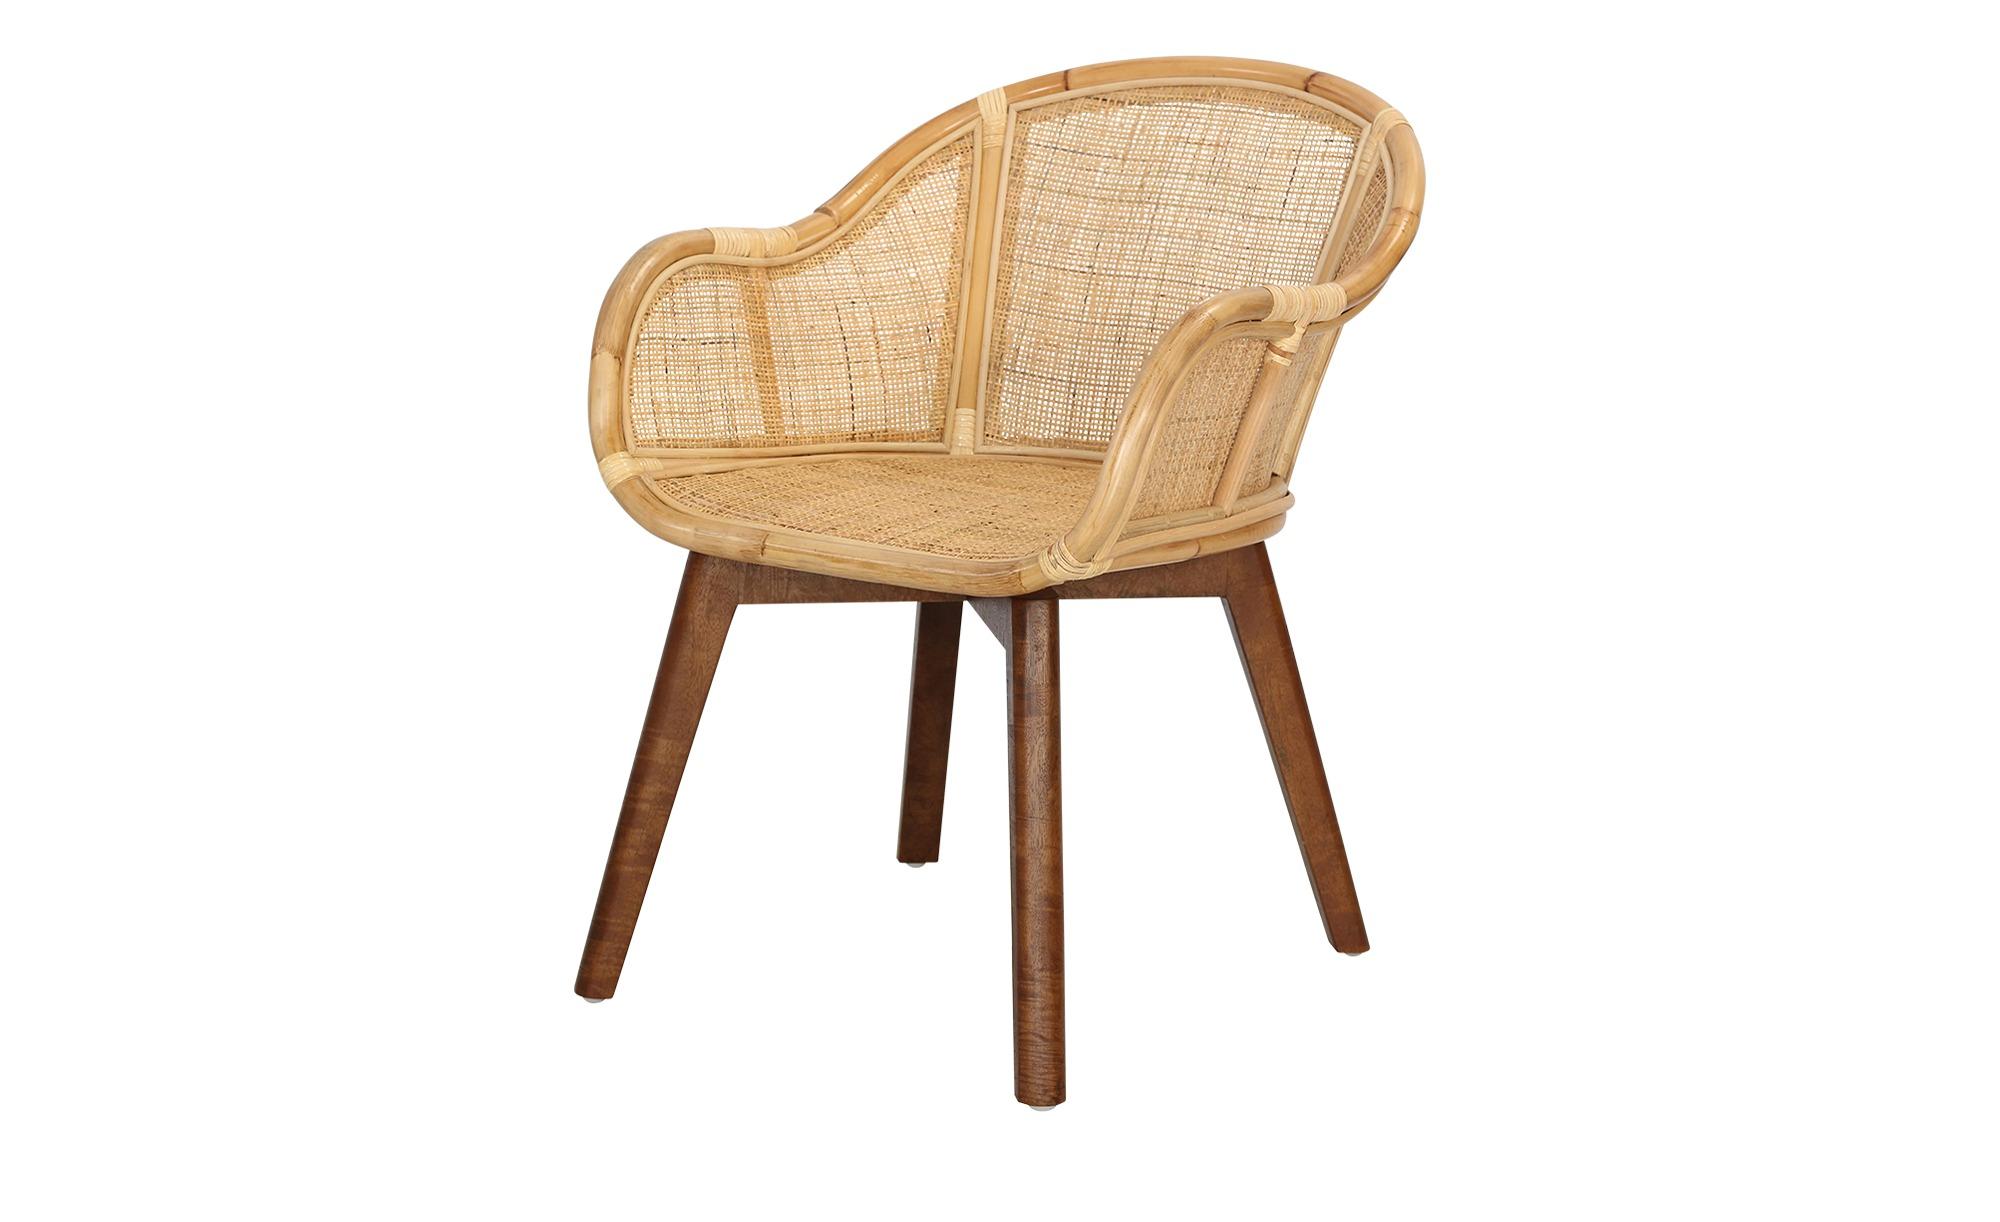 Rattanstuhl  Tweed Me ¦ holzfarben Stühle > Esszimmerstühle > Esszimmerstühle mit Armlehnen - Höffner